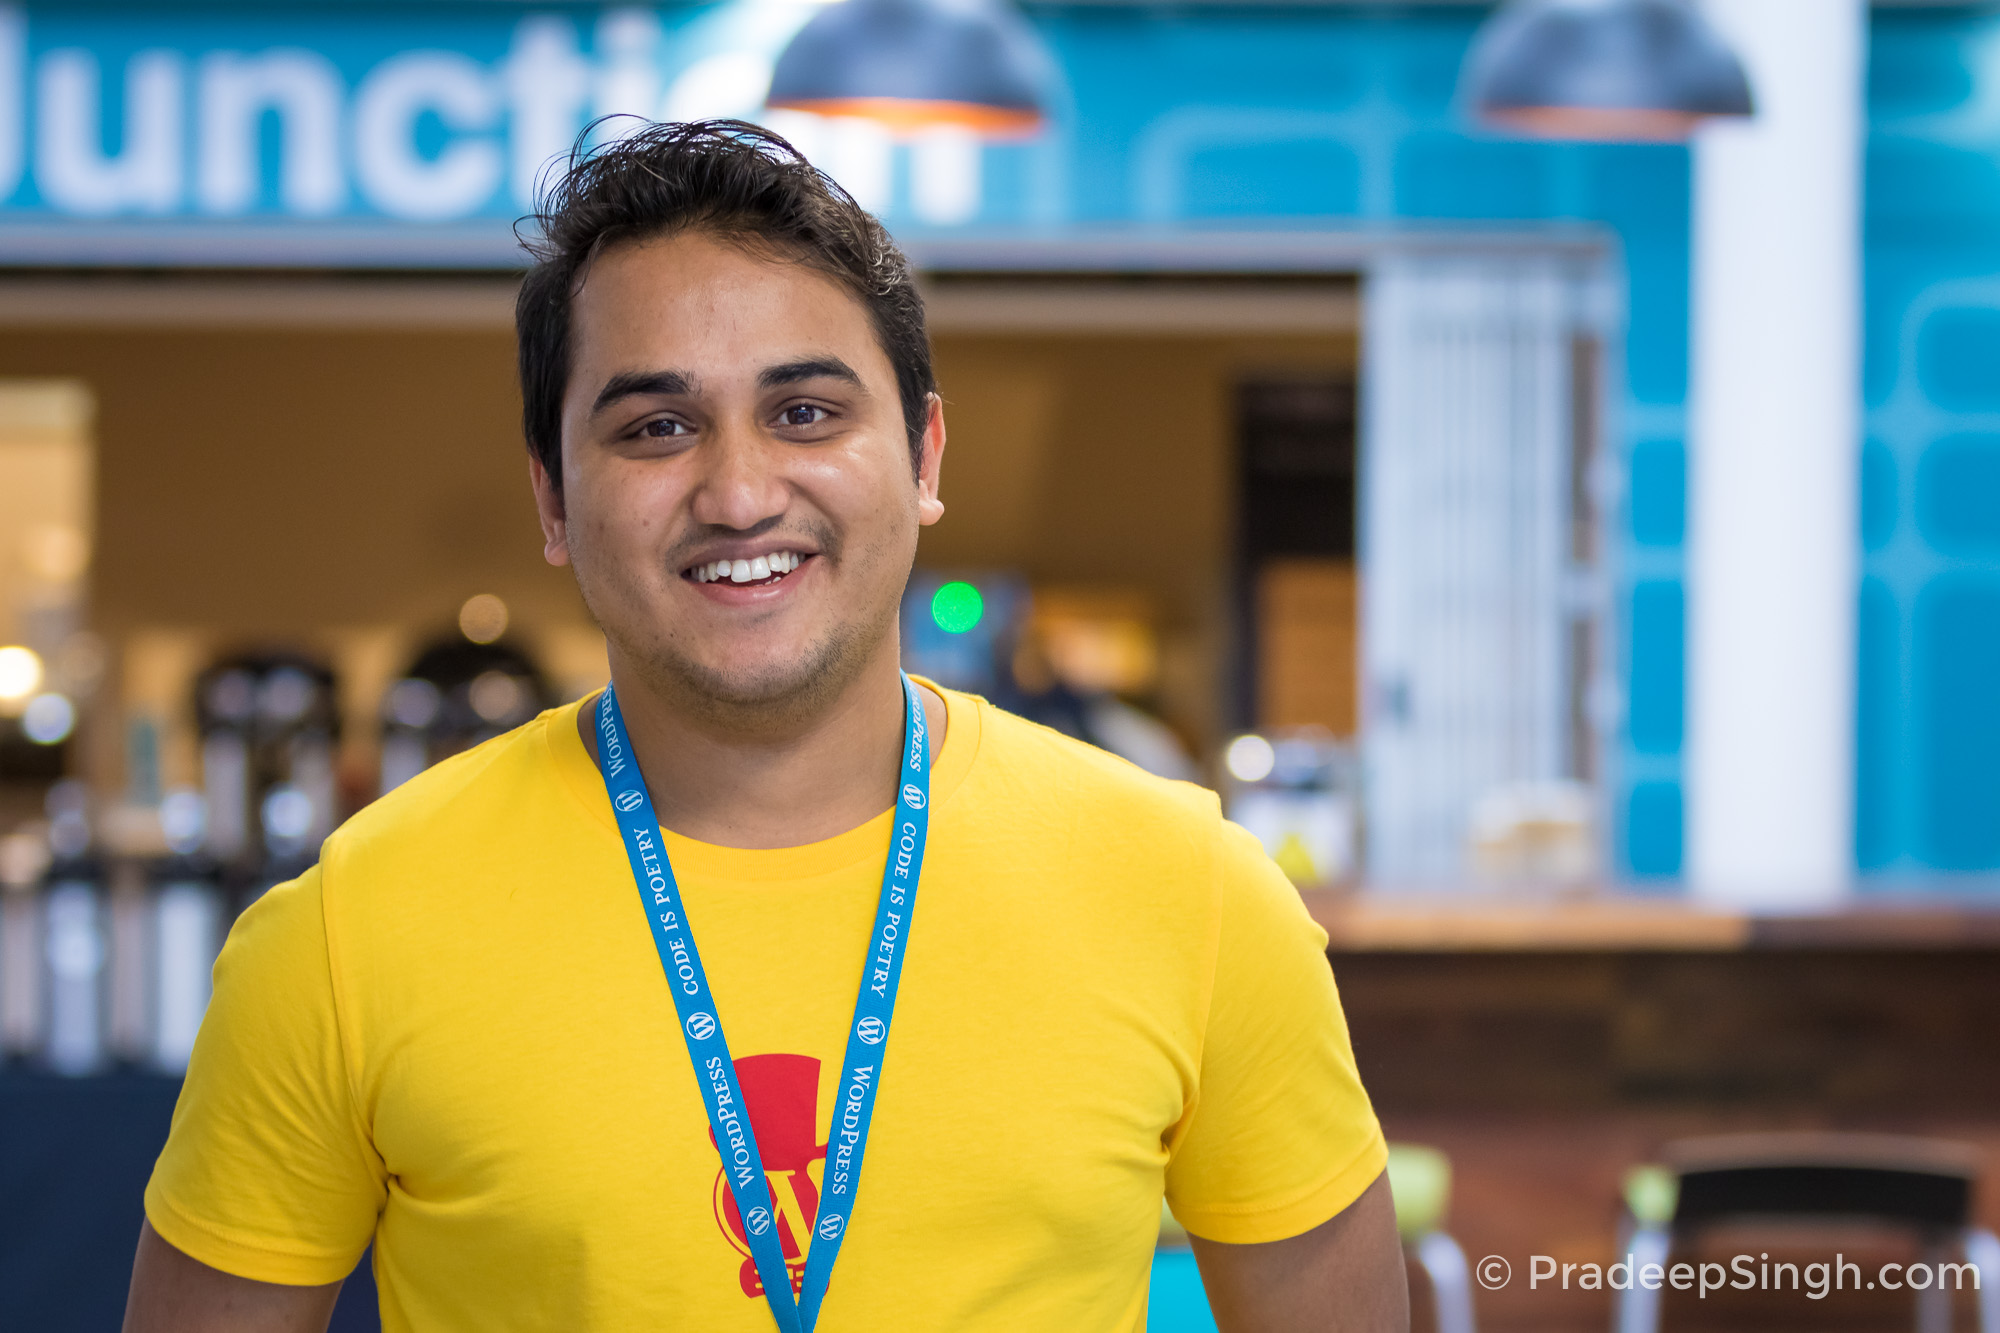 Pradeep Singh WPism WordCamp London Pradeep Singh Photo-5100